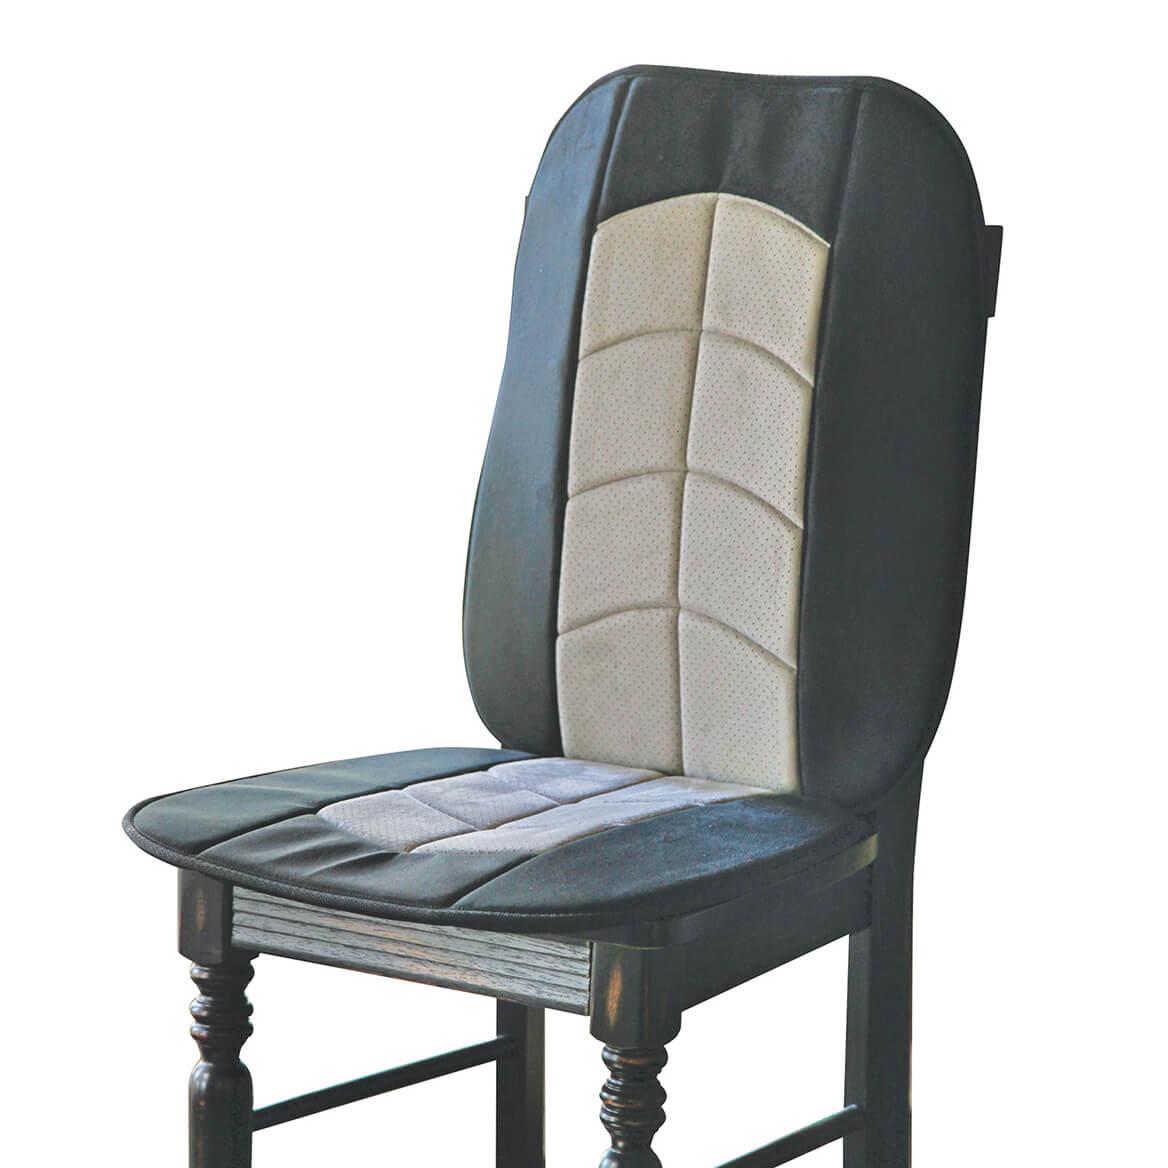 Memory Foam Seat Cushion-369804